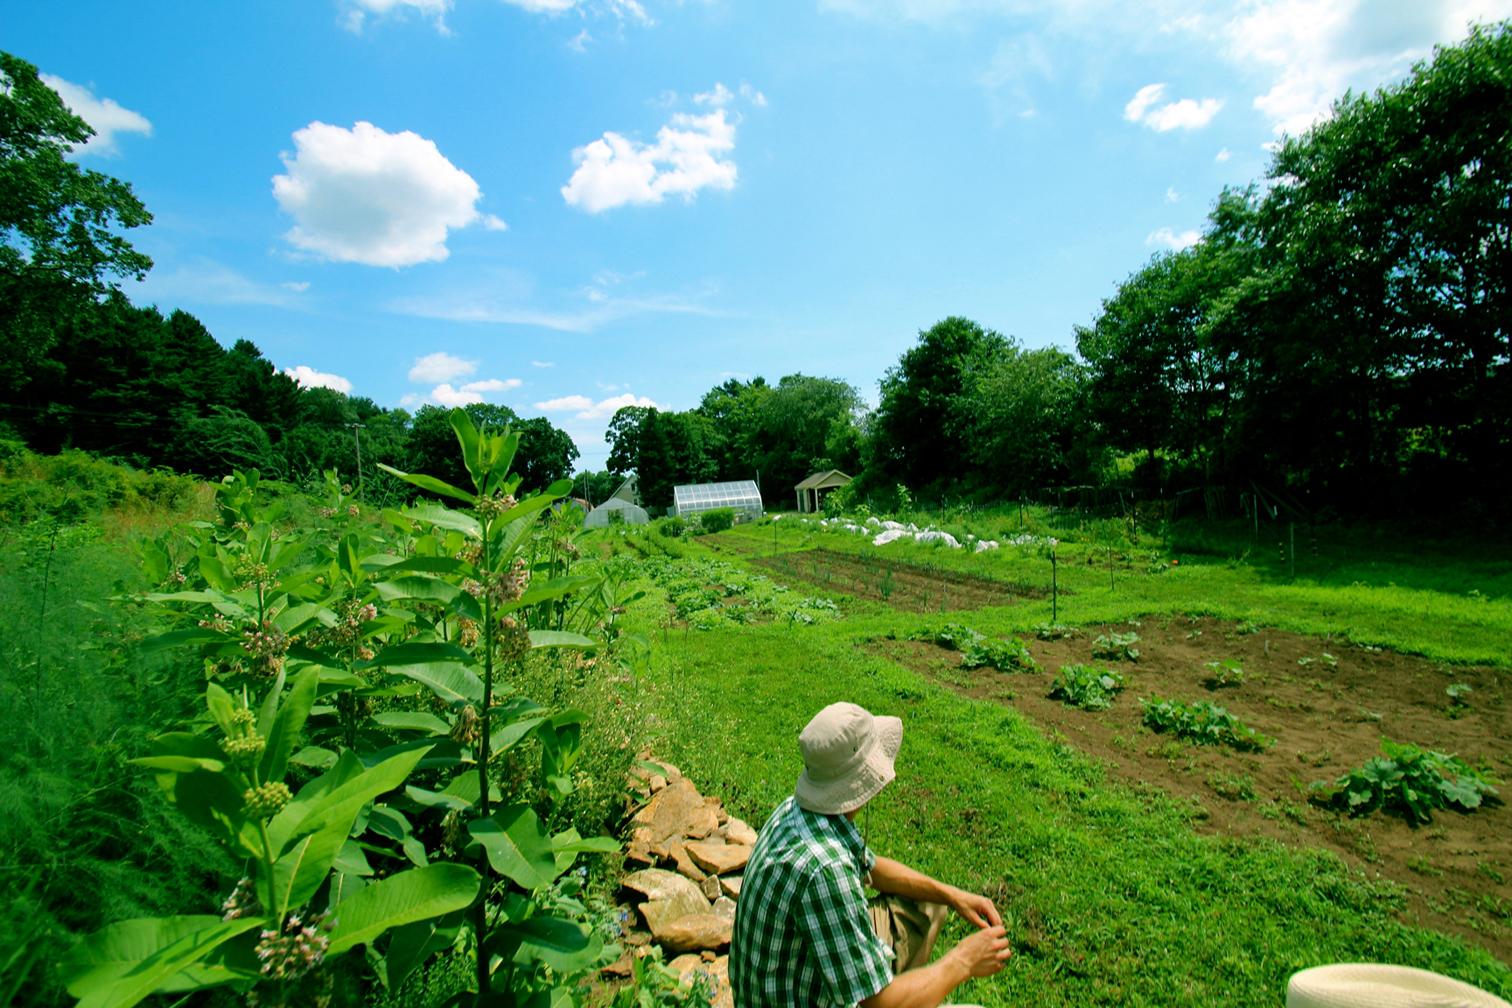 Spring Valley Student Farm